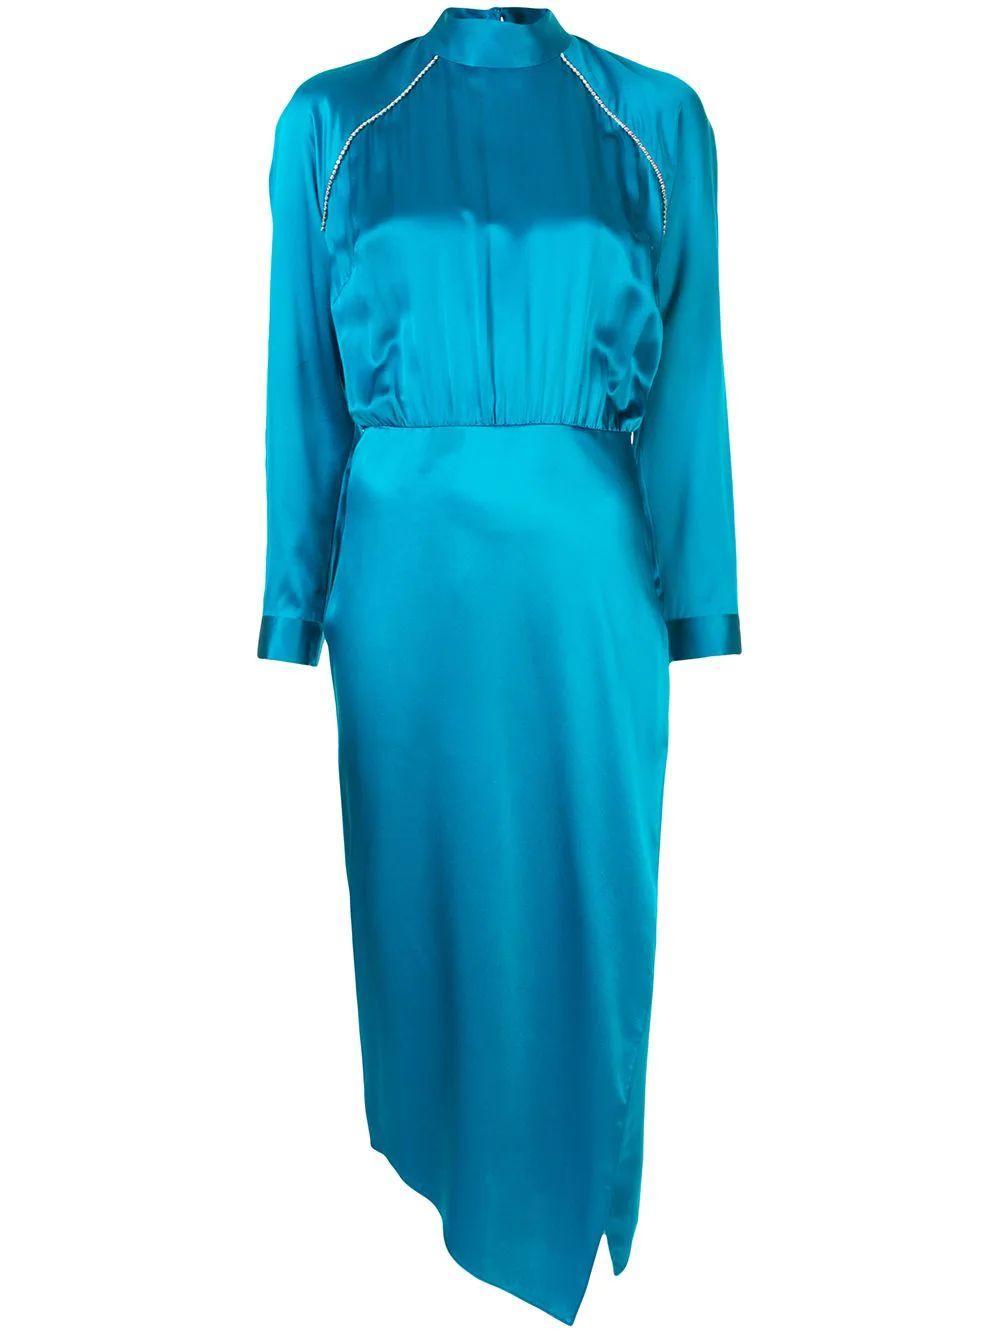 Raglan Sleeve Dress With Crystals Item # M9267